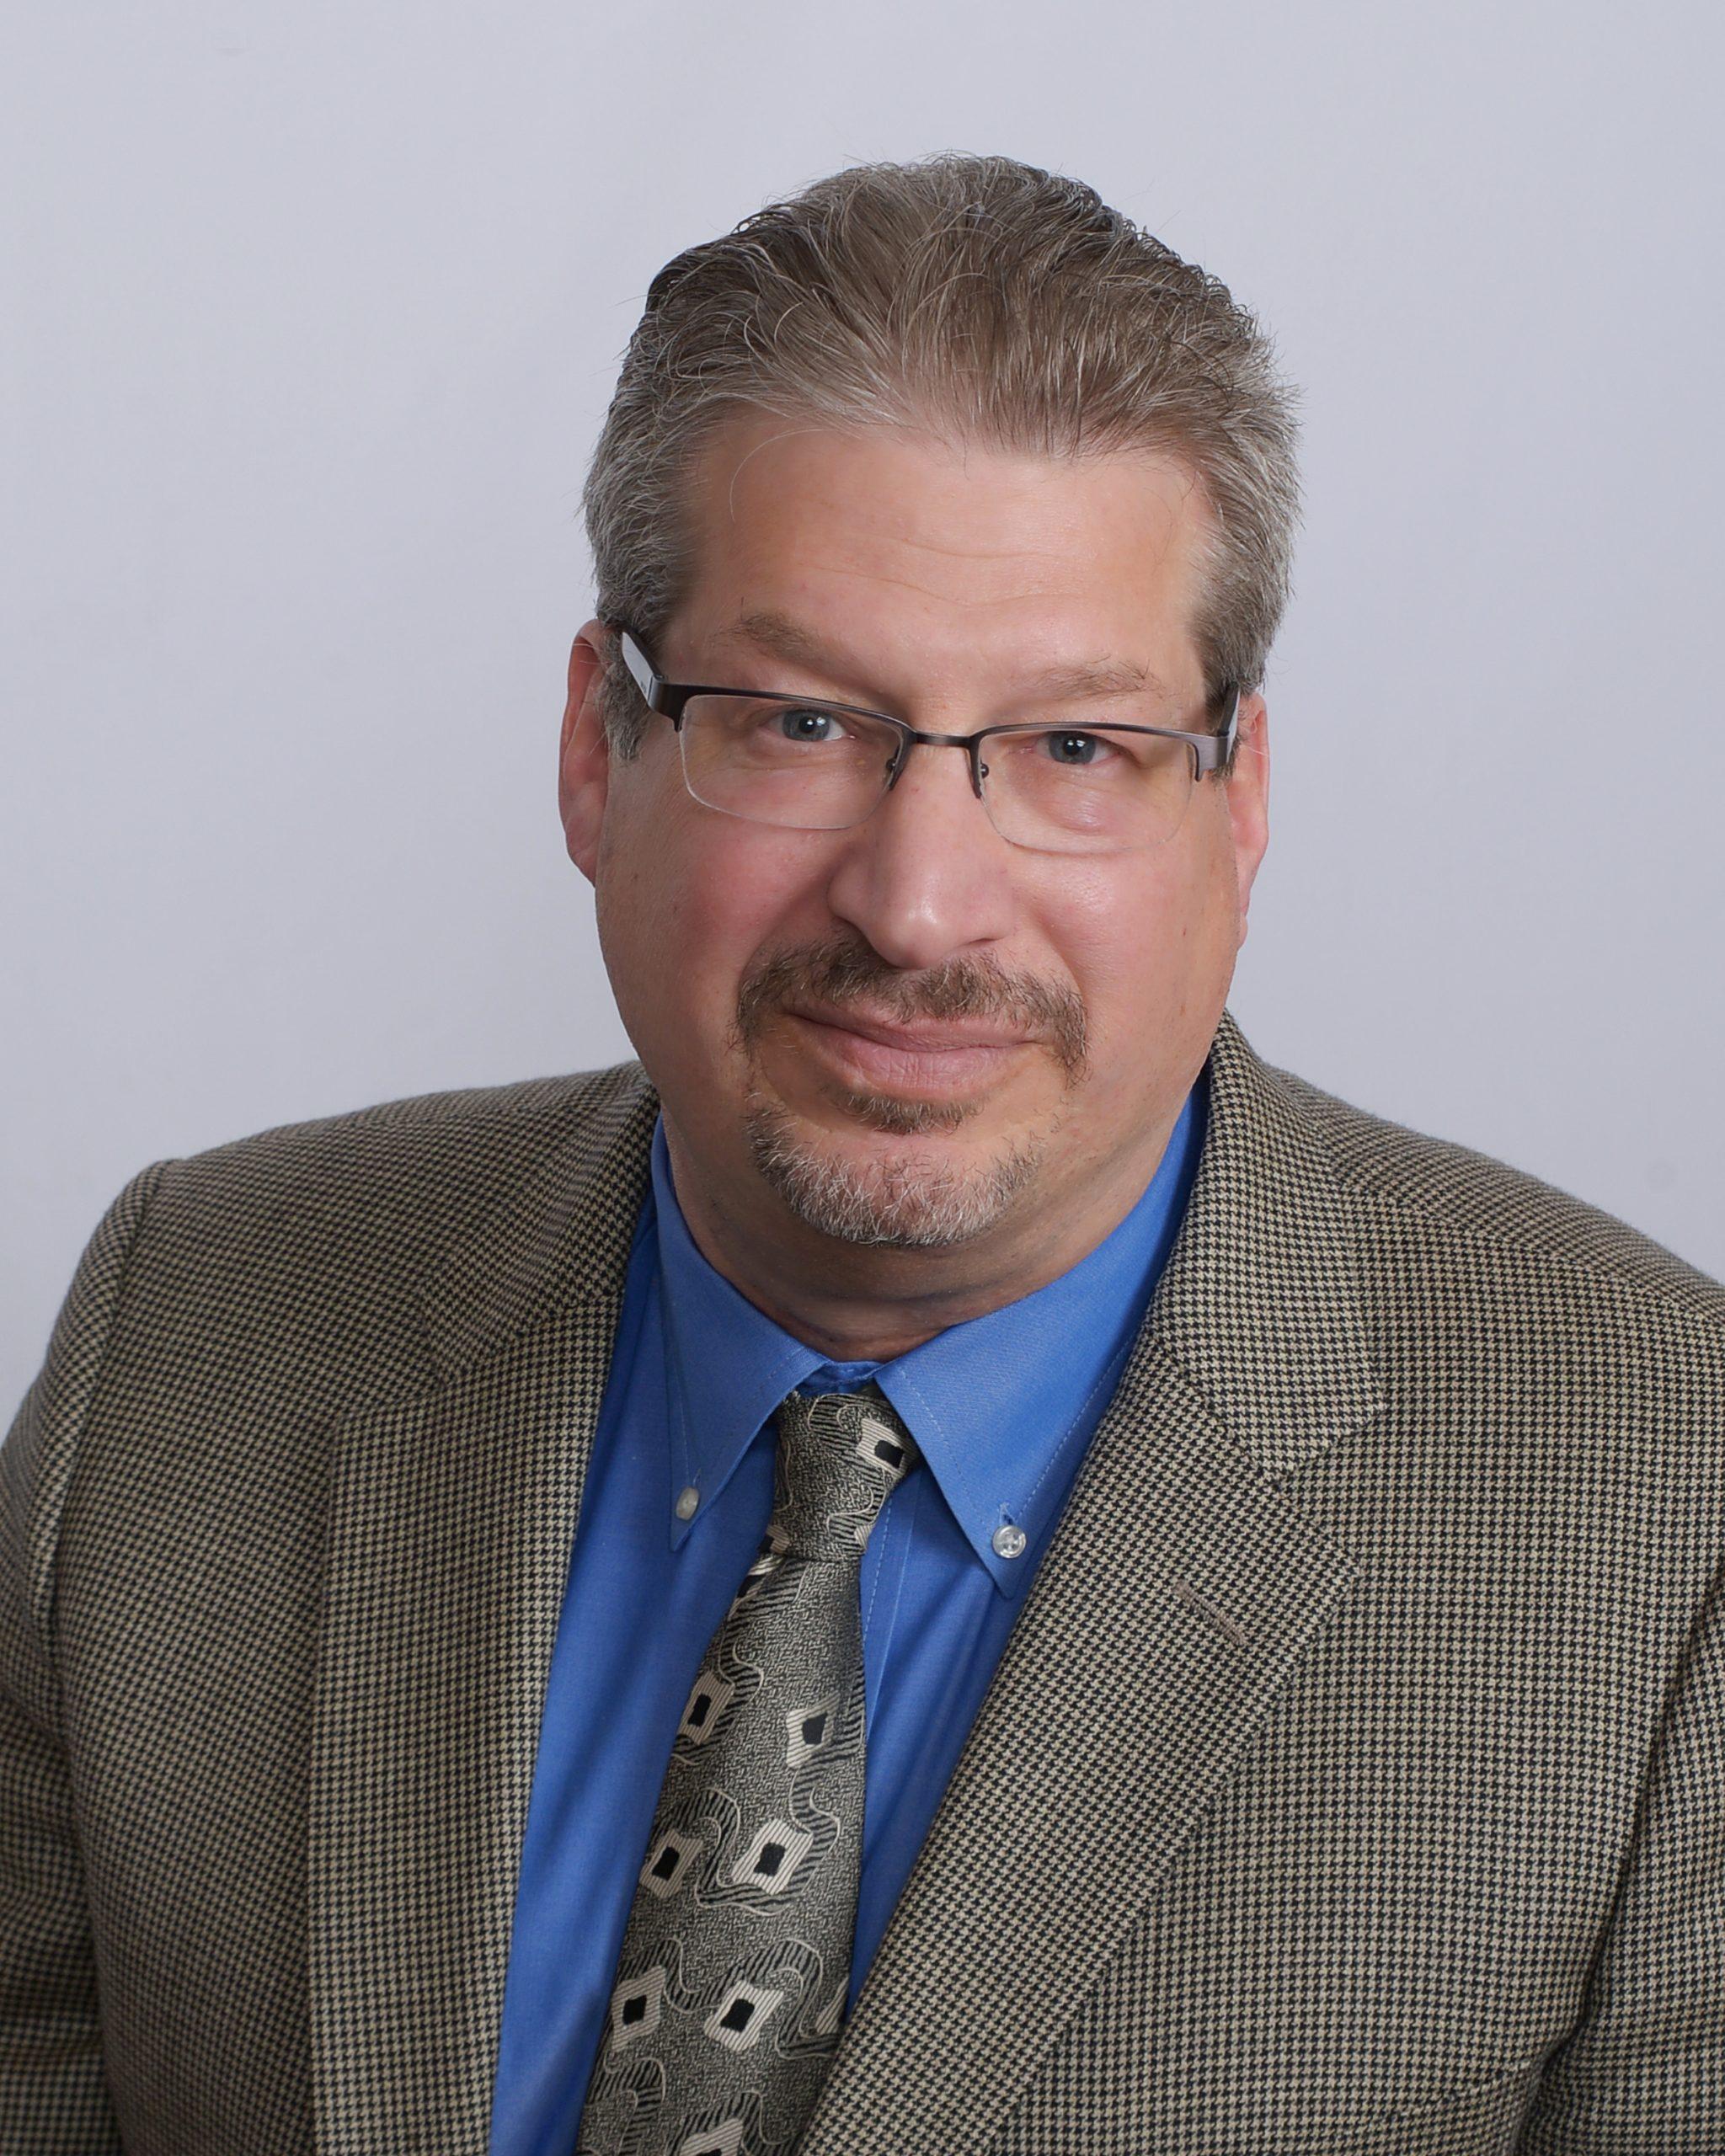 Kevin R. Scudder